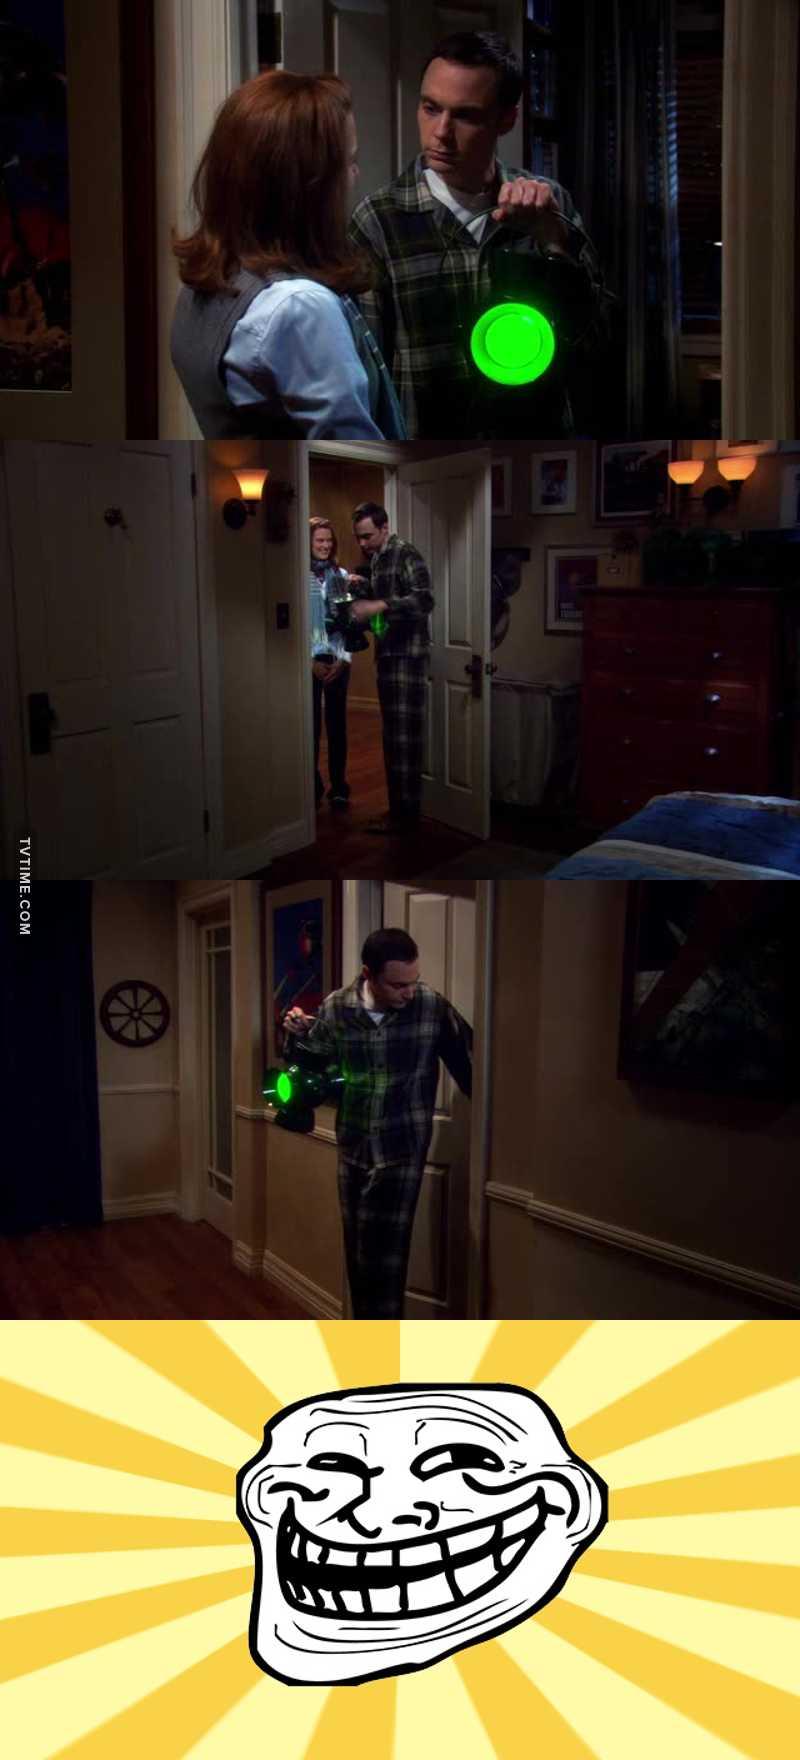 Sheldon, Sheldon 😂